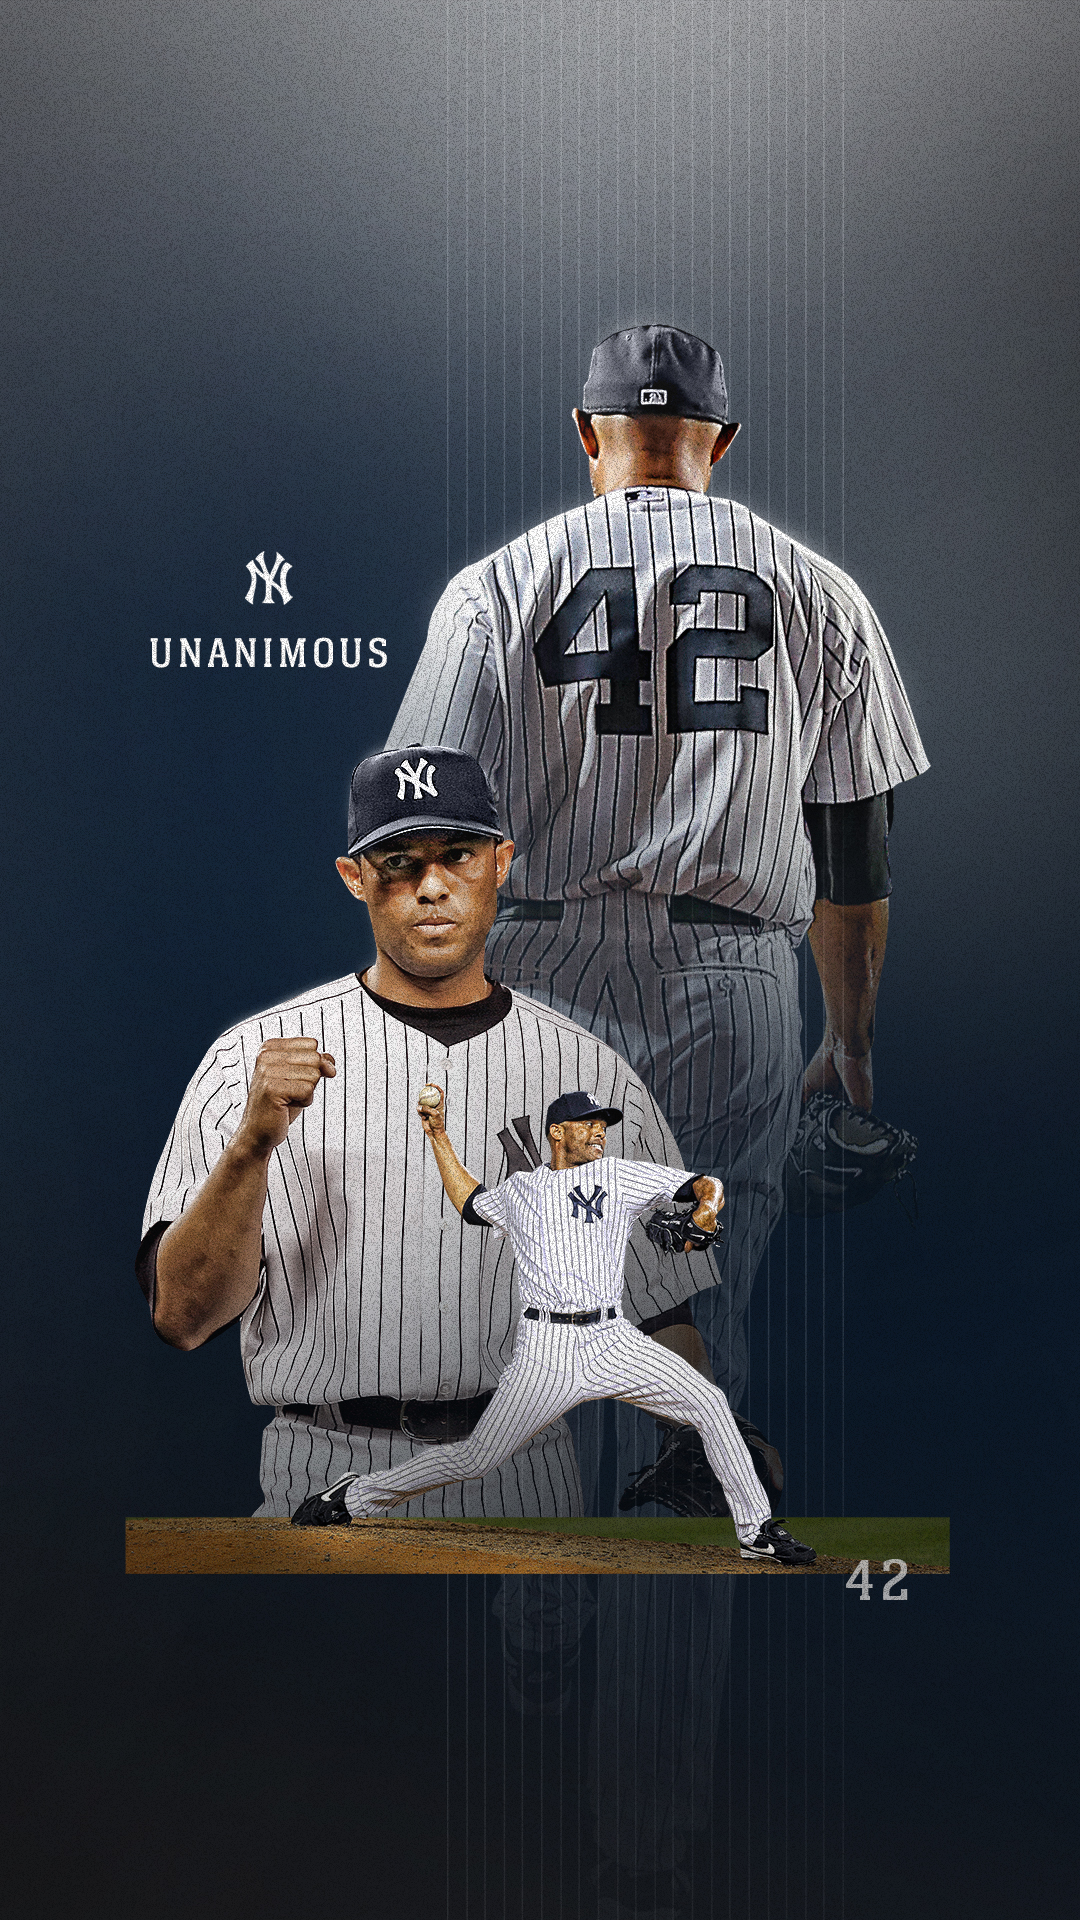 Mariano Rivera Wallpapers New York Yankees 2019 1368616